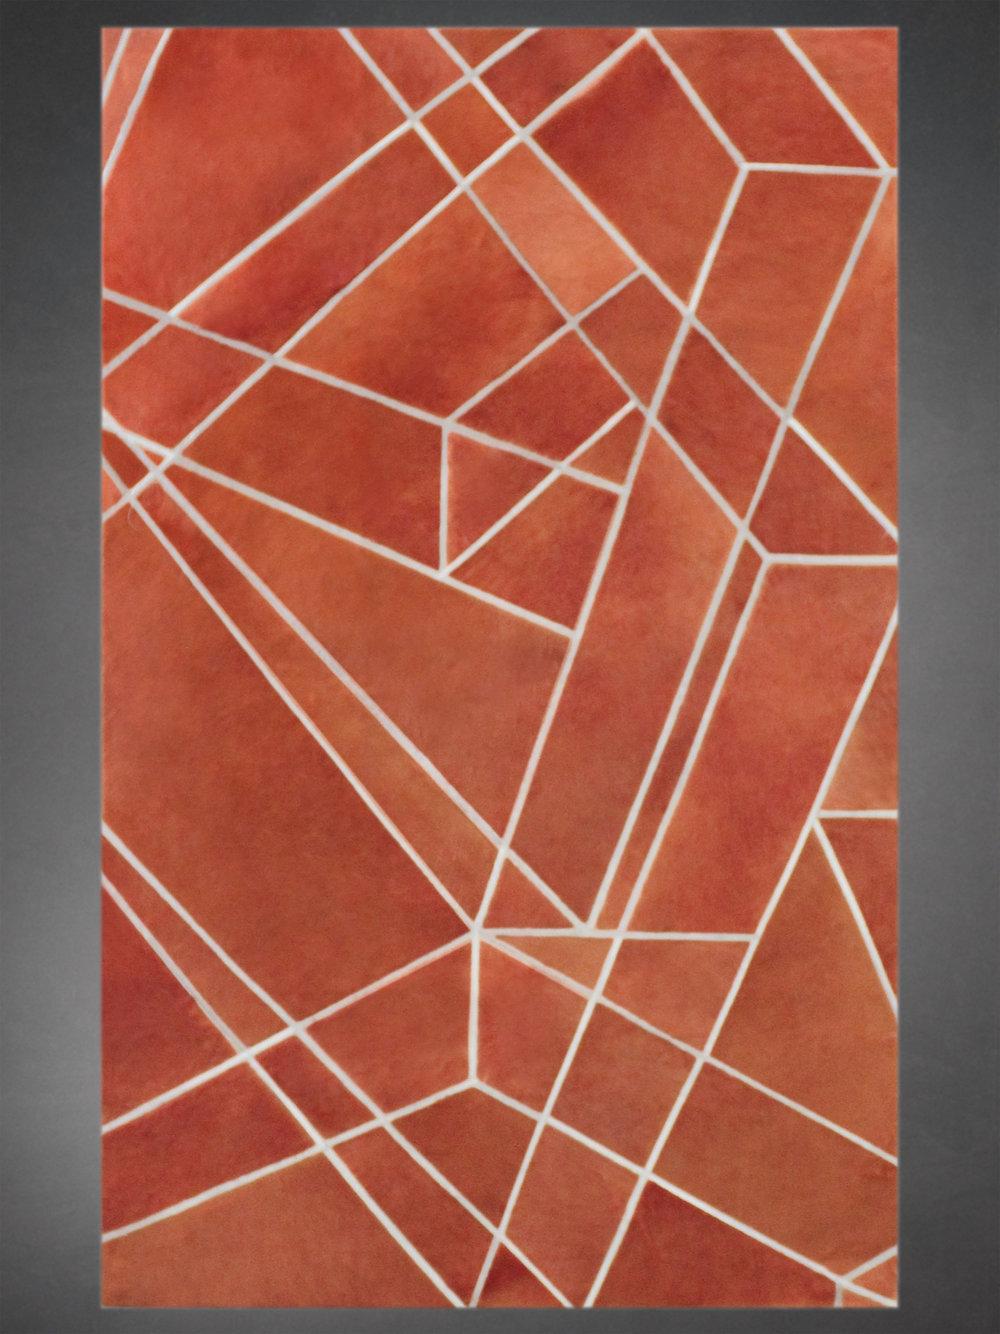 Contemporary designed fur rug in a geometric, cubist pattern in red-orange.